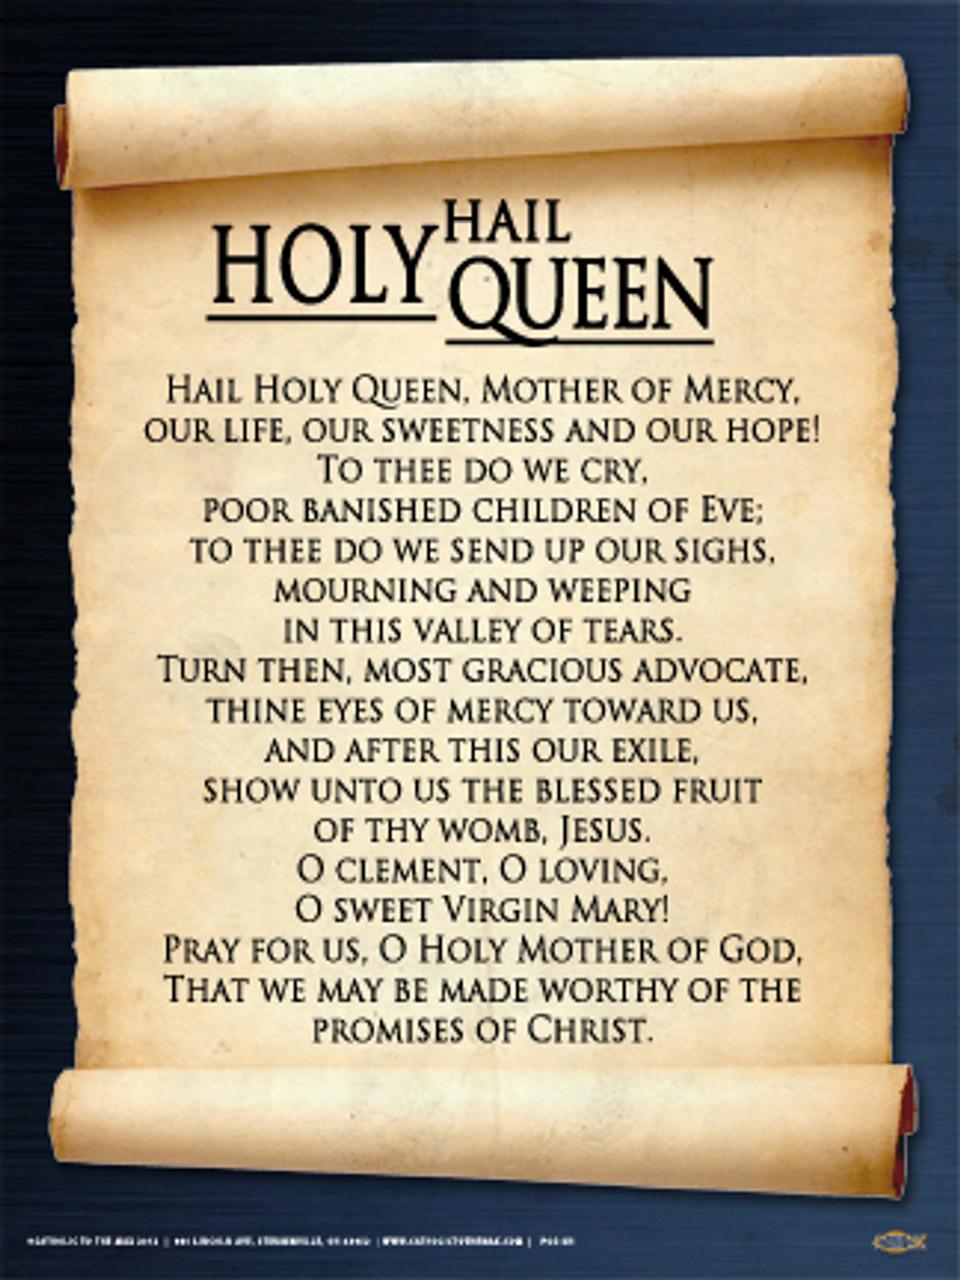 photograph regarding Hail Holy Queen Prayer Printable known as Hail Holy Queen Poster